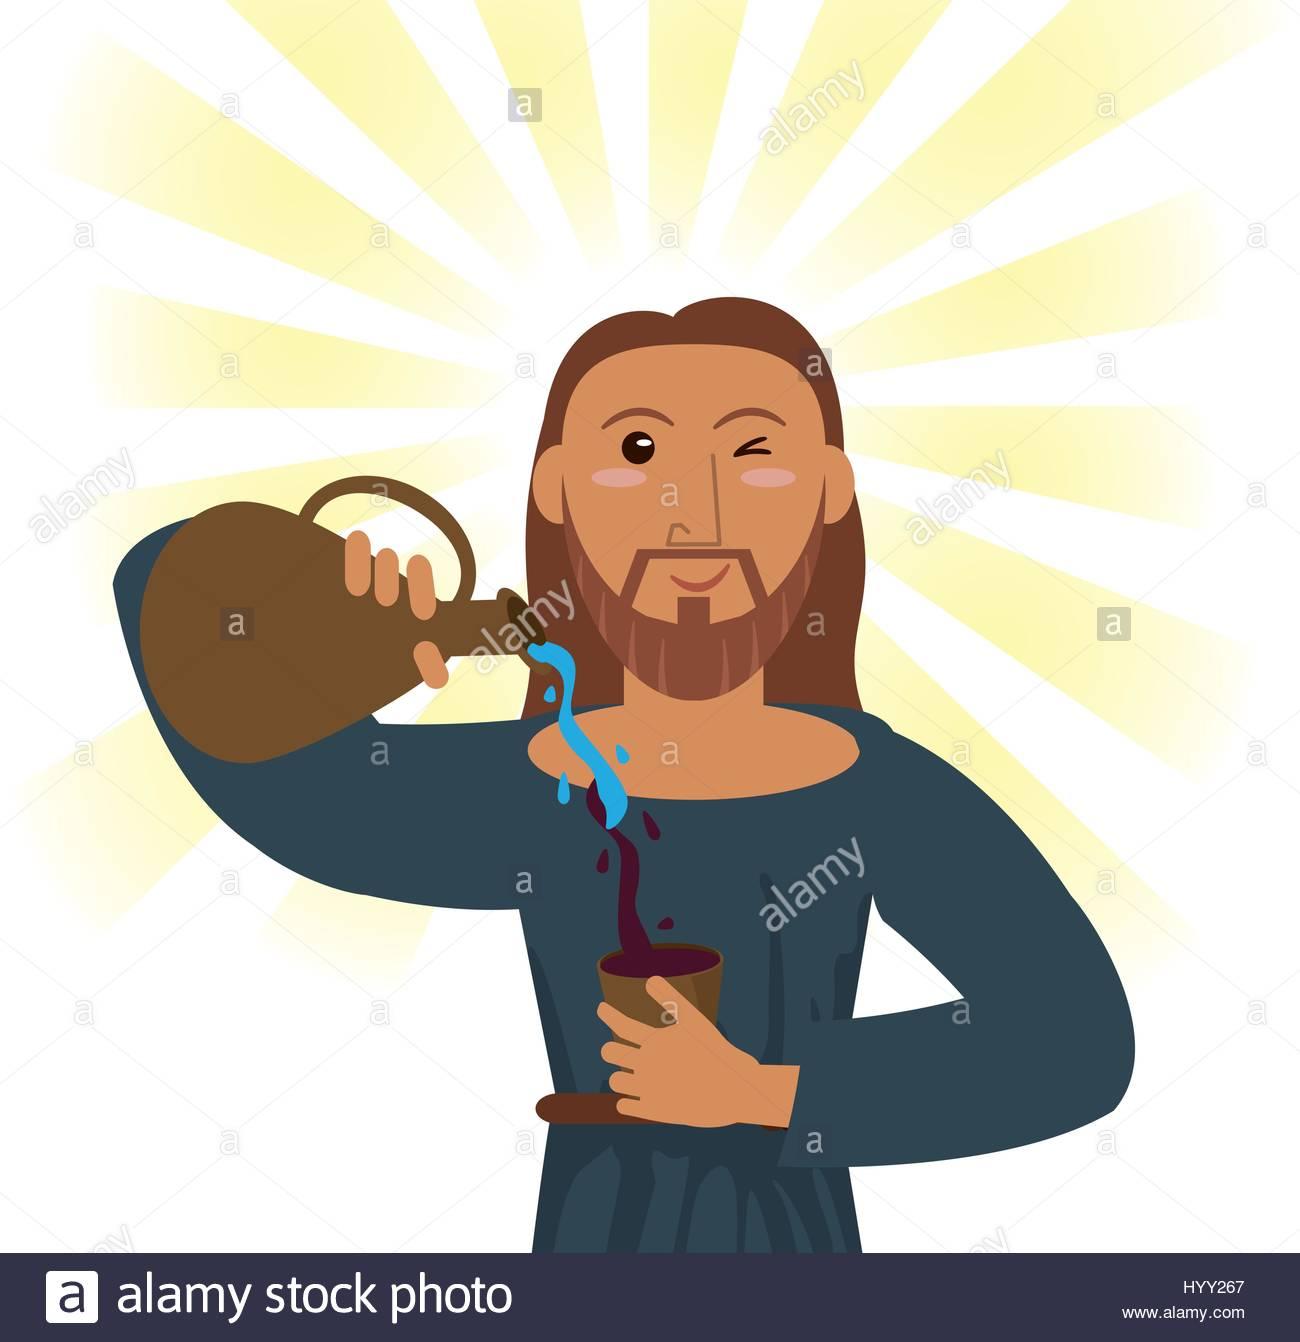 1300x1342 Jesus Water Into Wine Stock Photos Amp Jesus Water Into Wine Stock